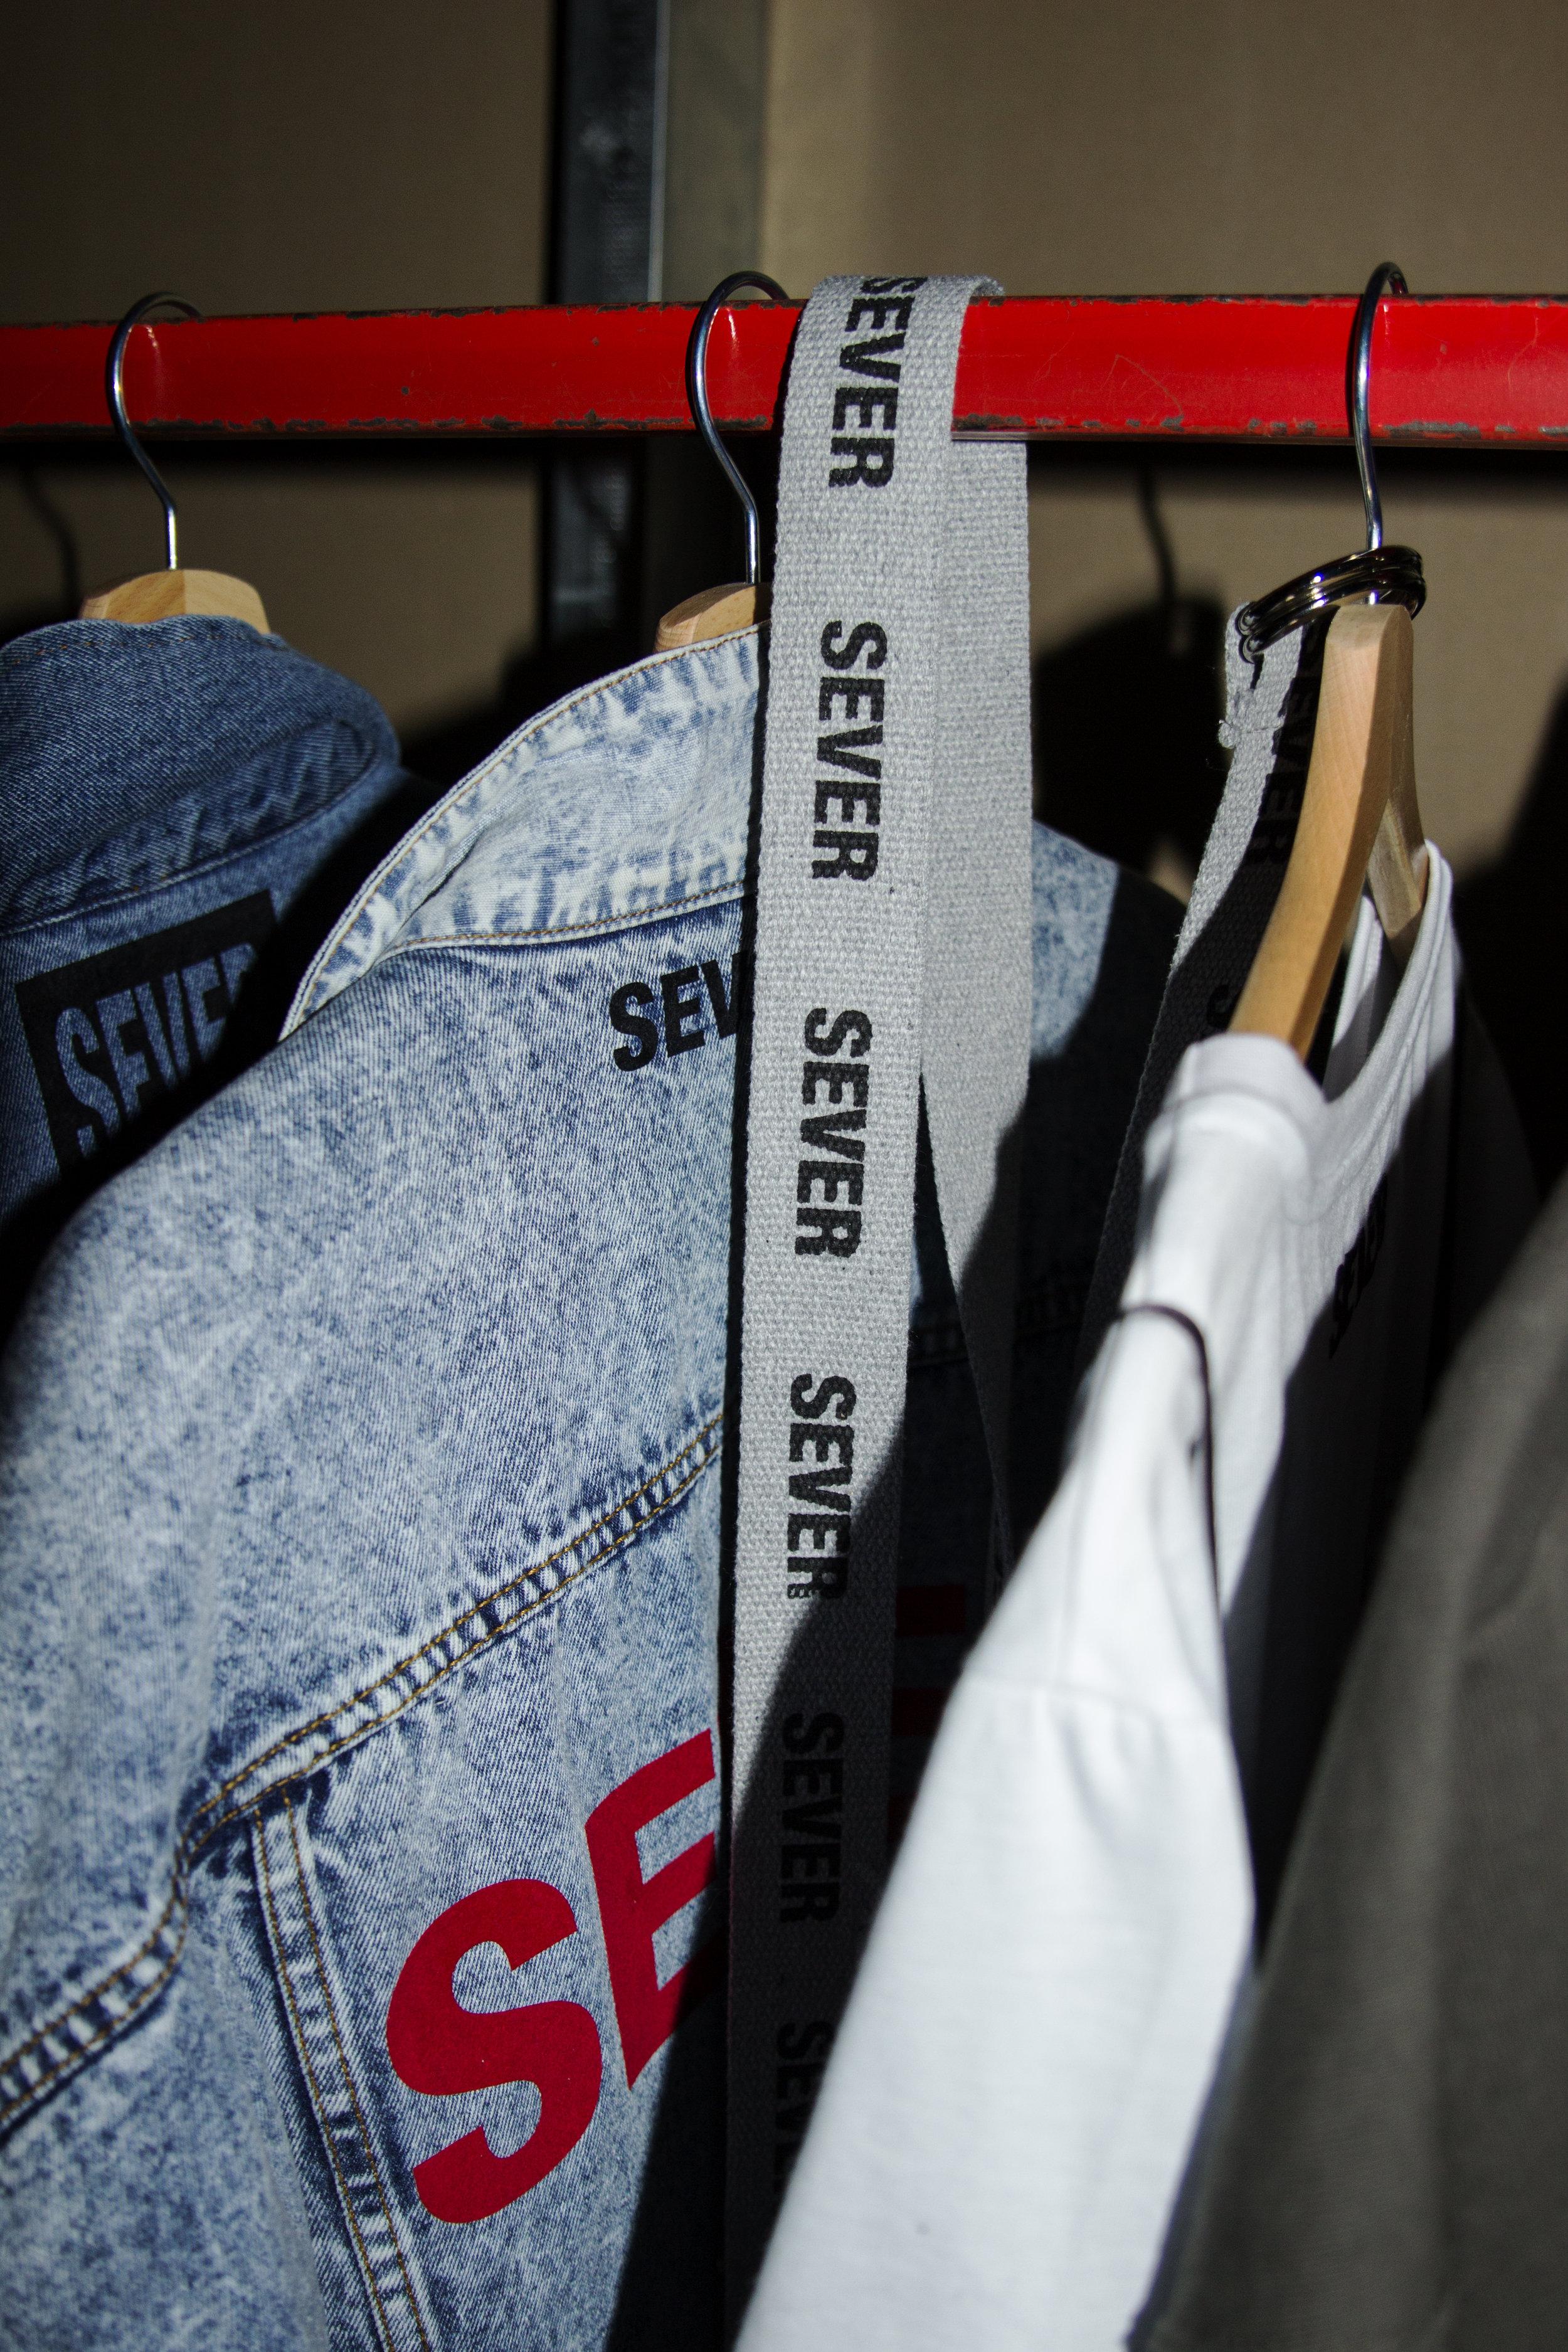 robert-sever-kolekcija-dizajner-behind-the-scenes-luka-lajic-photography (5).jpg